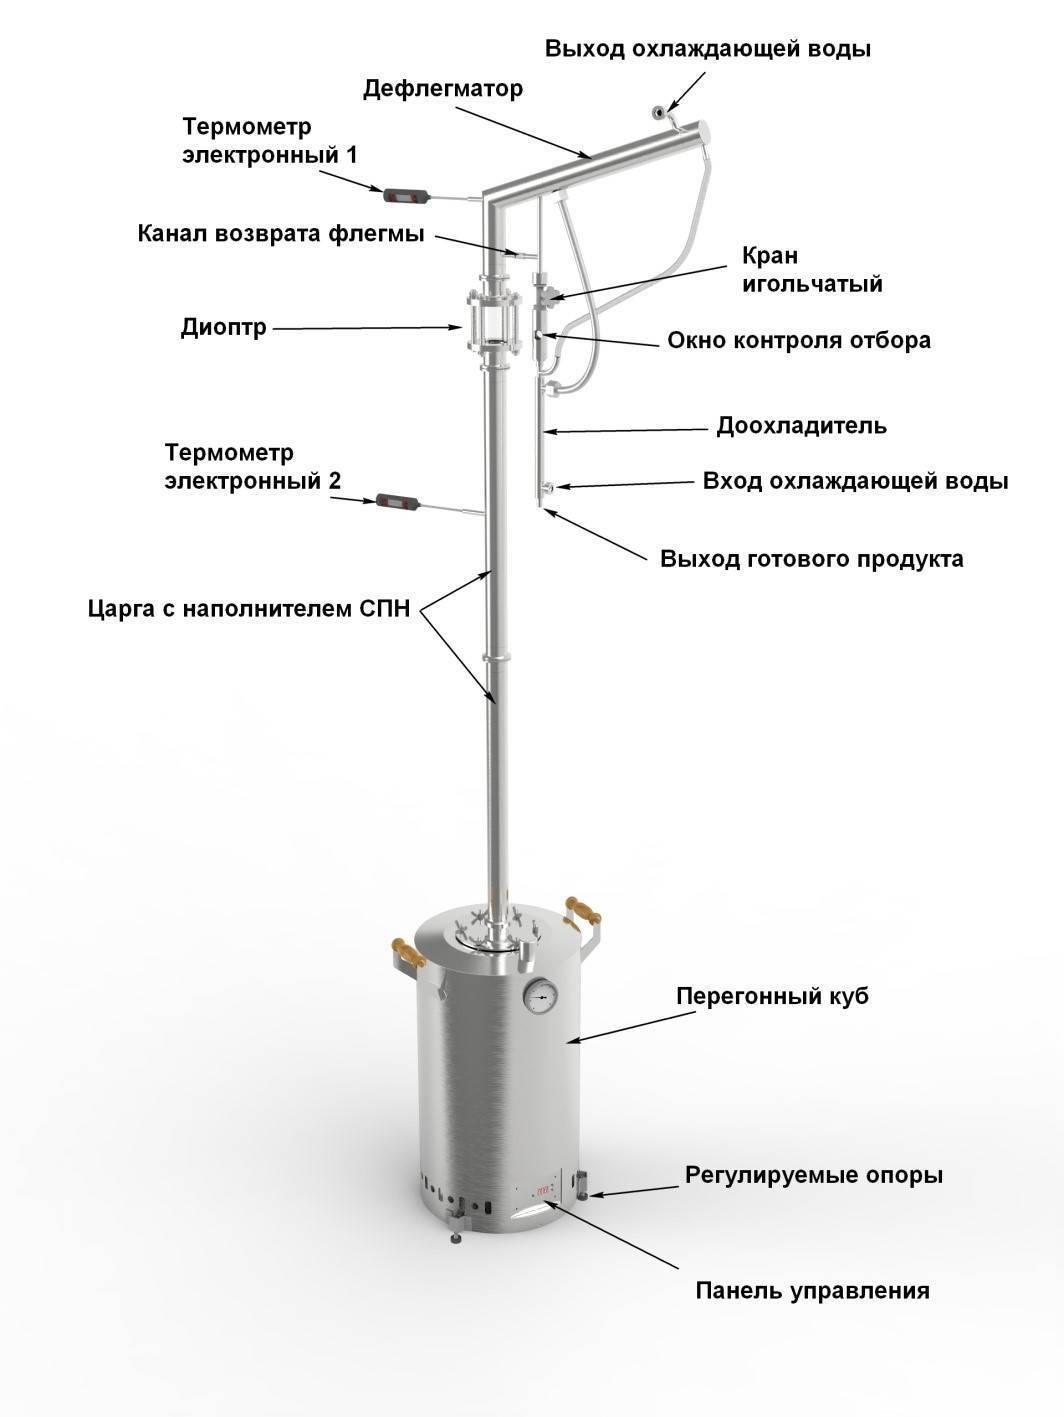 Ректификационная колонна своими руками по чертежам с размерами